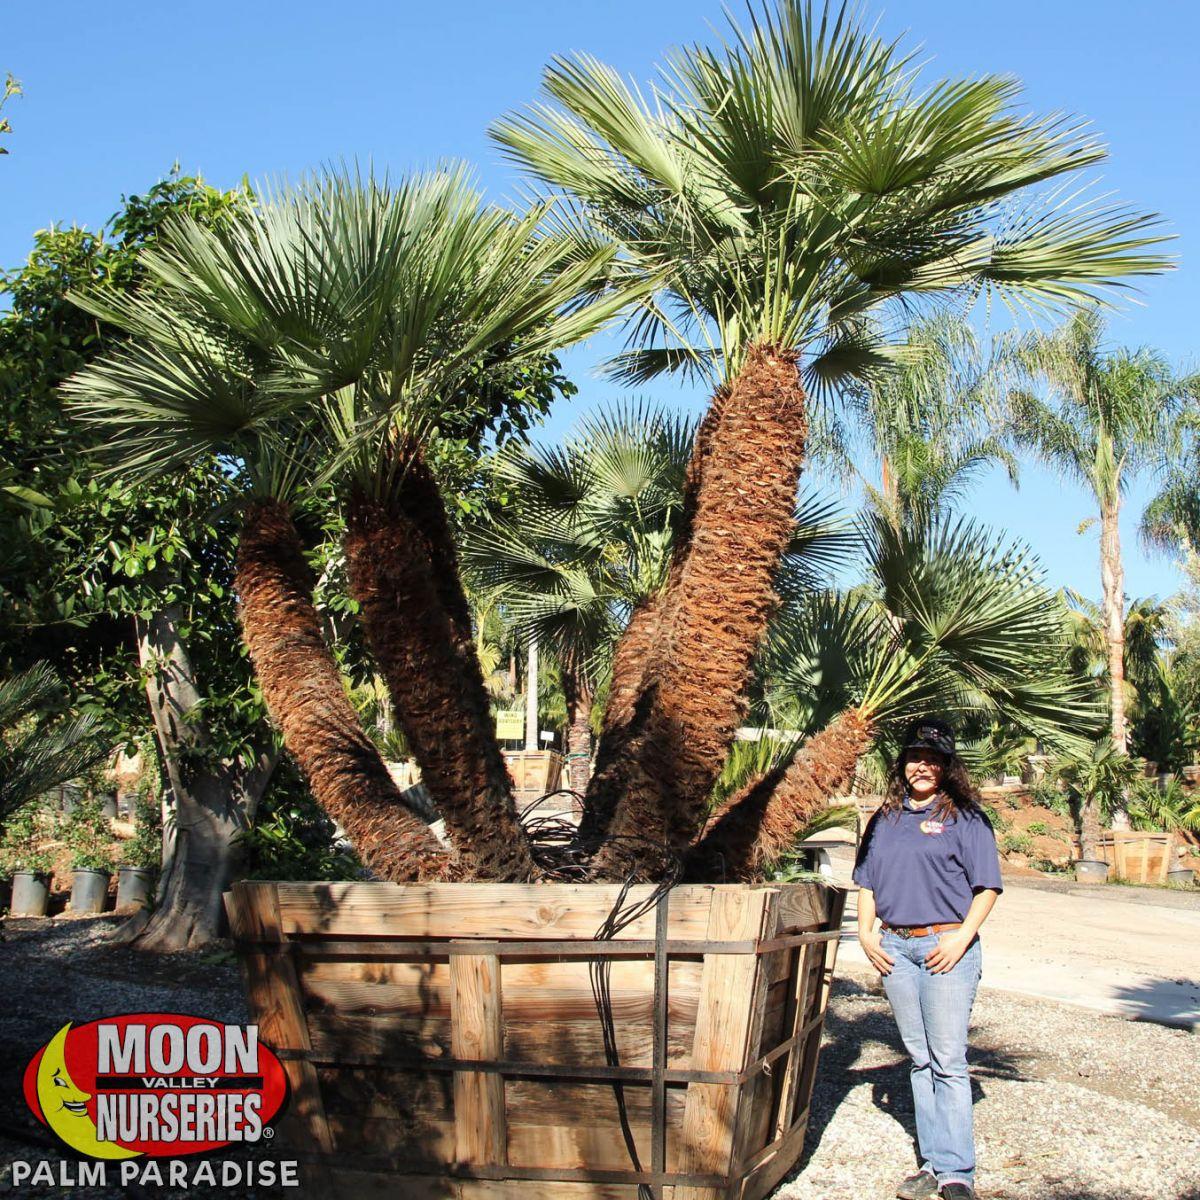 Mediterranean Fan Palm Palm Tree Palm Paradise Nursery